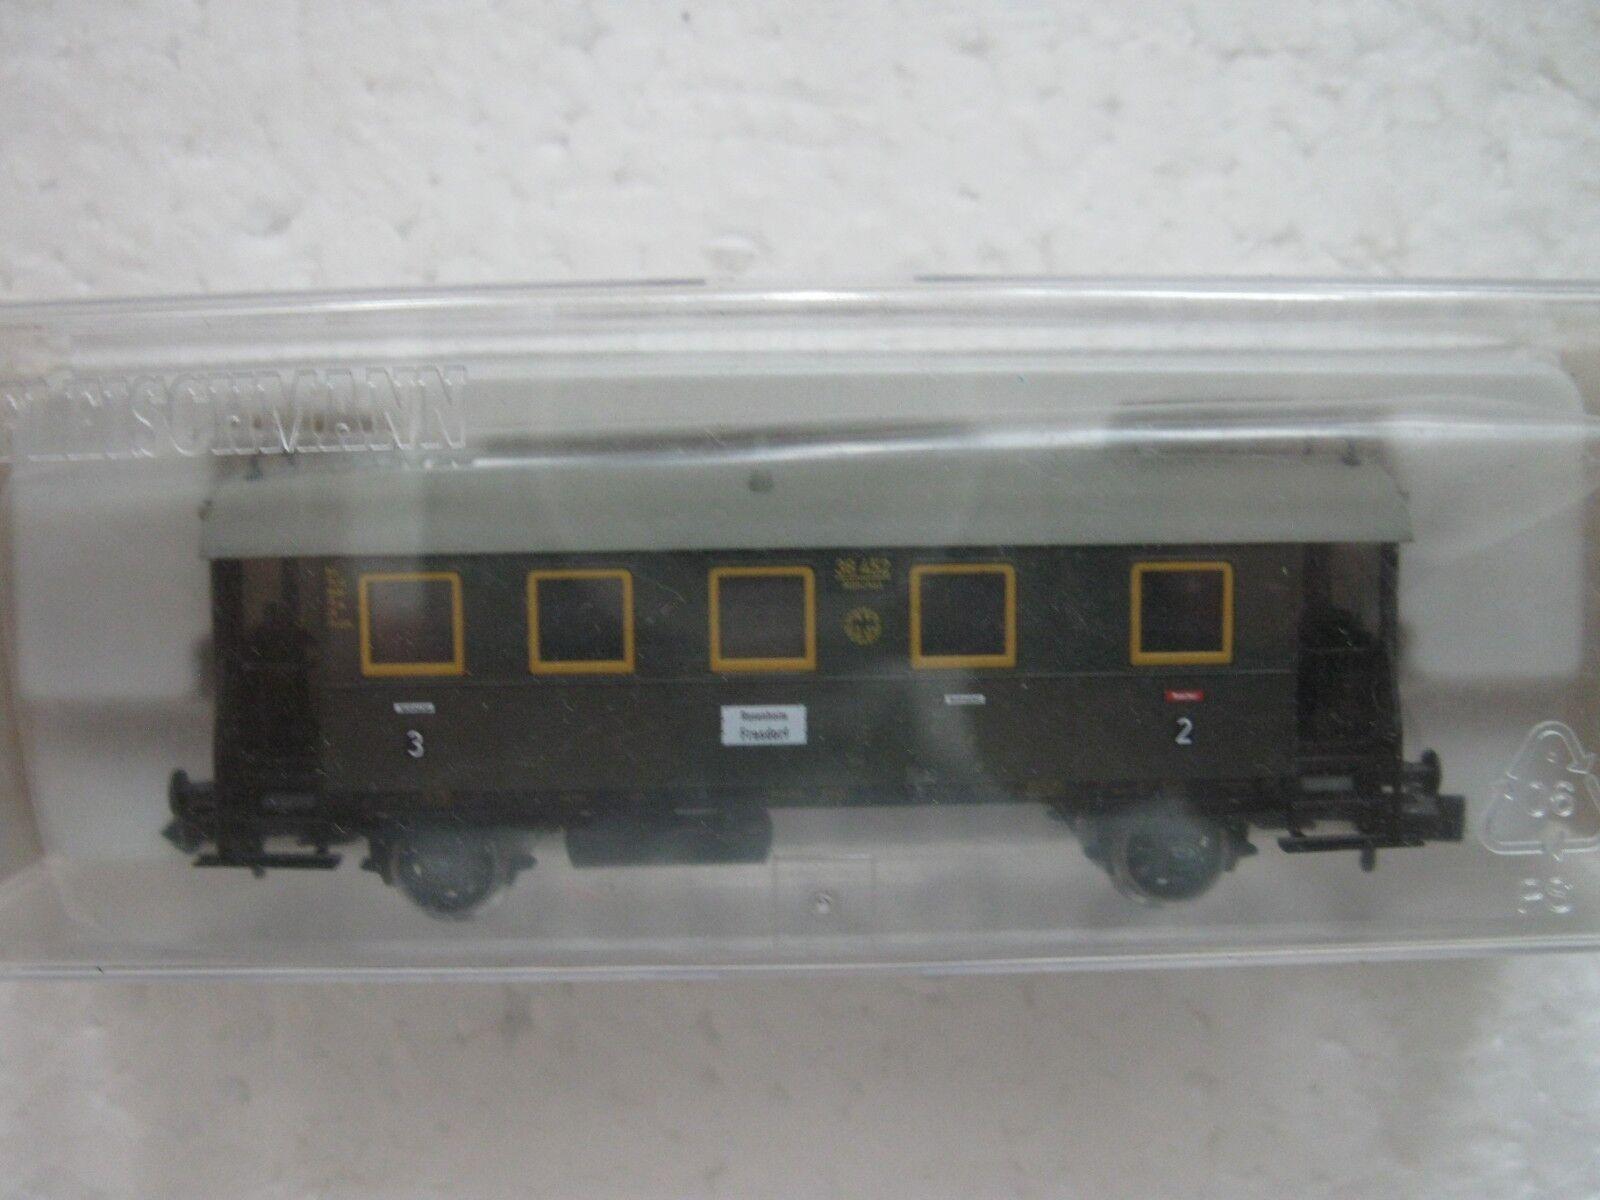 Fleischmann 8091 K vetture DRG passeggeri DRG vetture Traccia N dbe40b